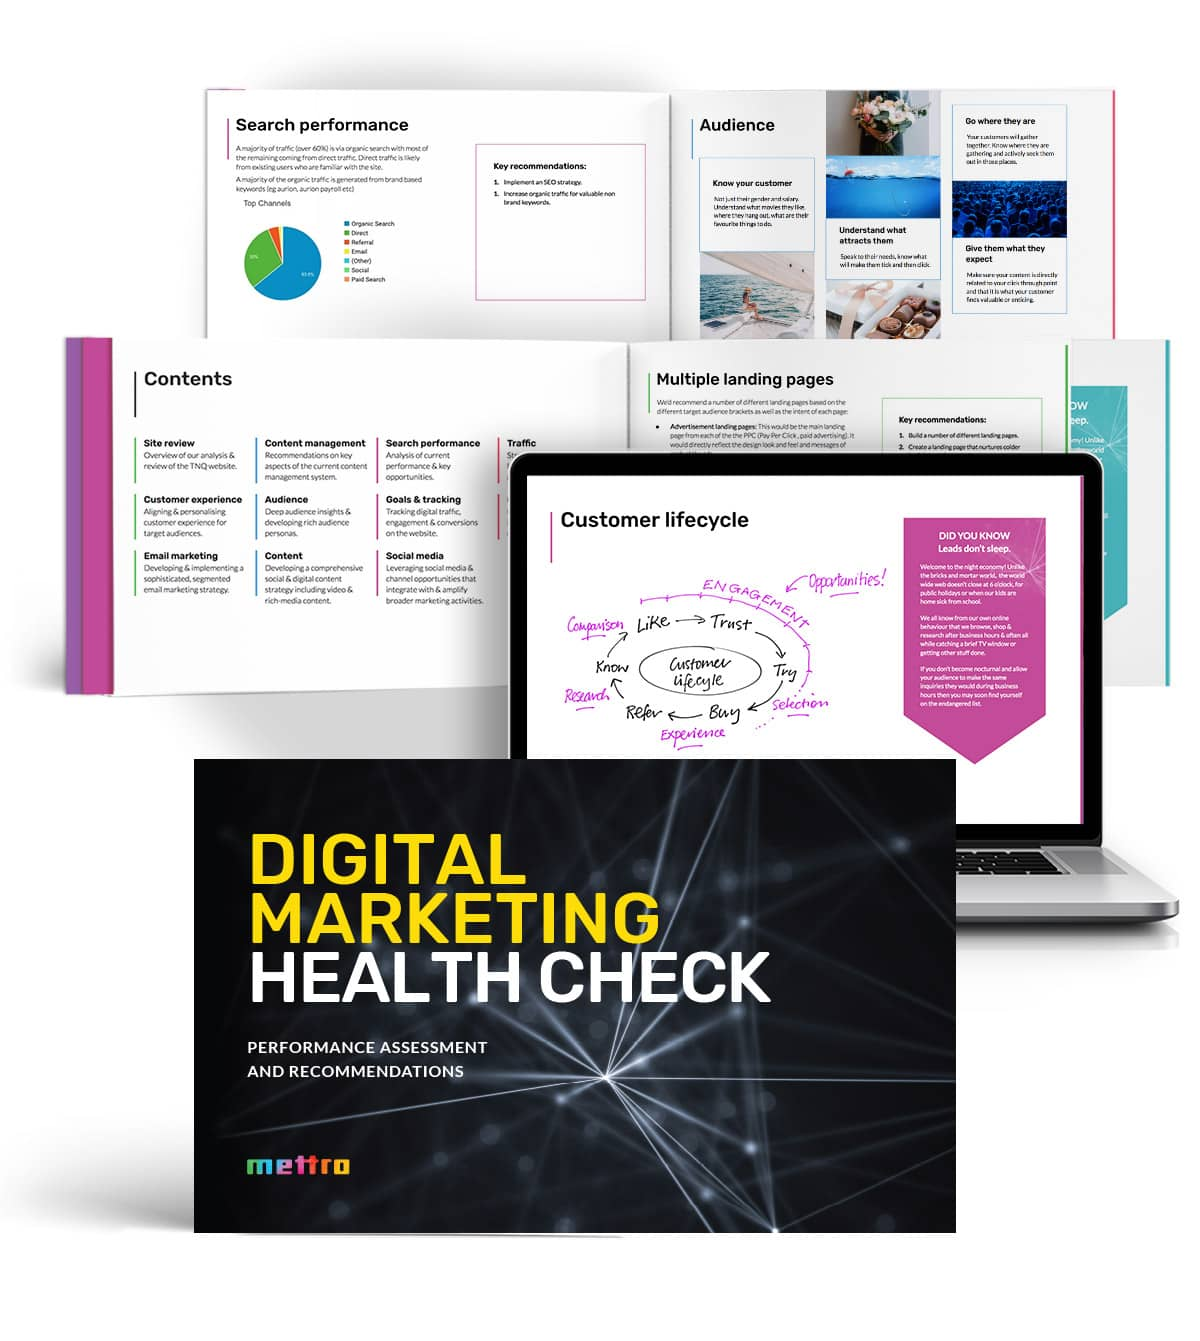 Mettro Digital Marketing Health Check